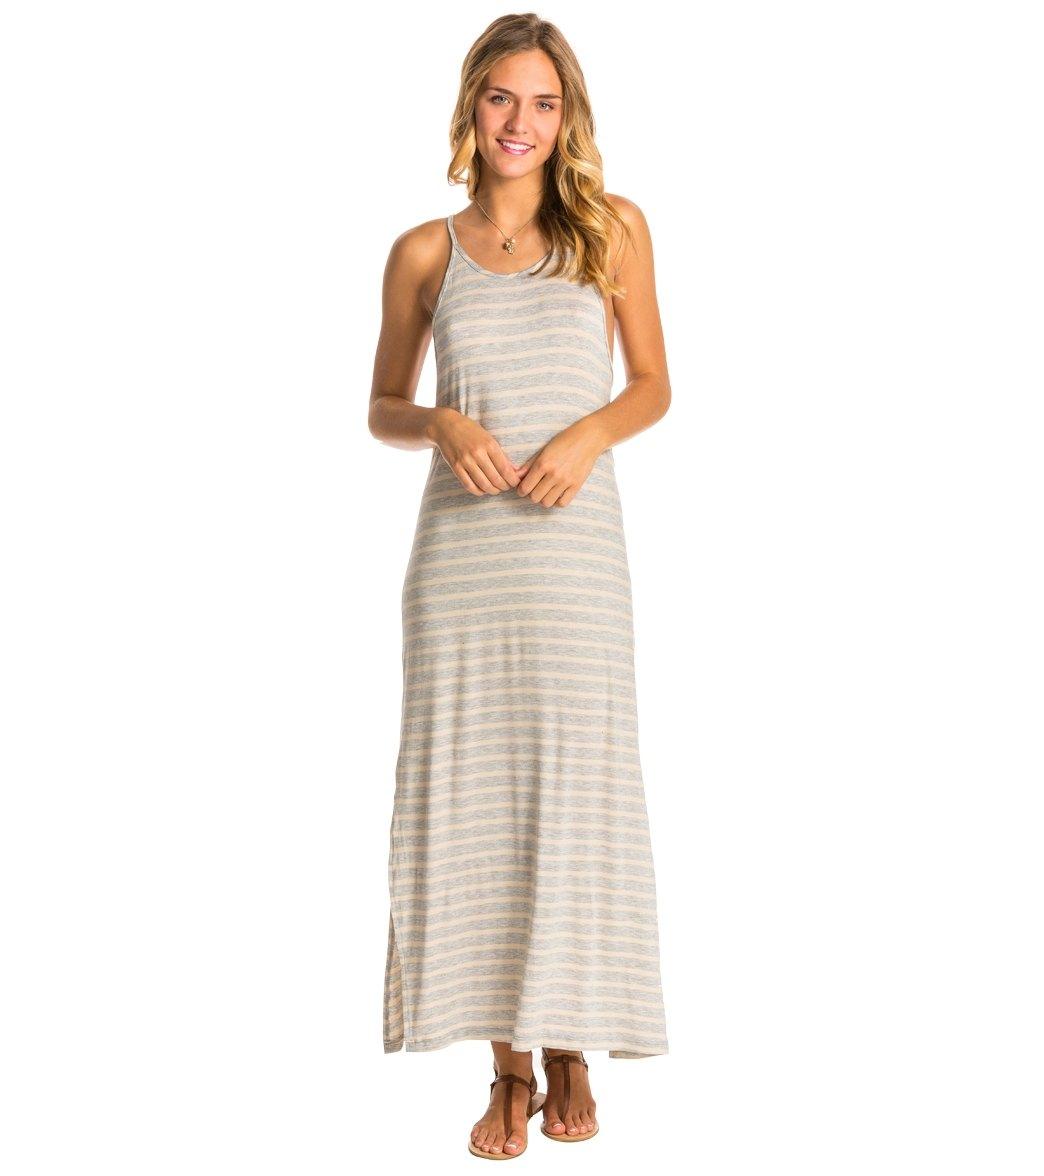 Lucy Love Sag Harbor Cocomo Maxi Dress